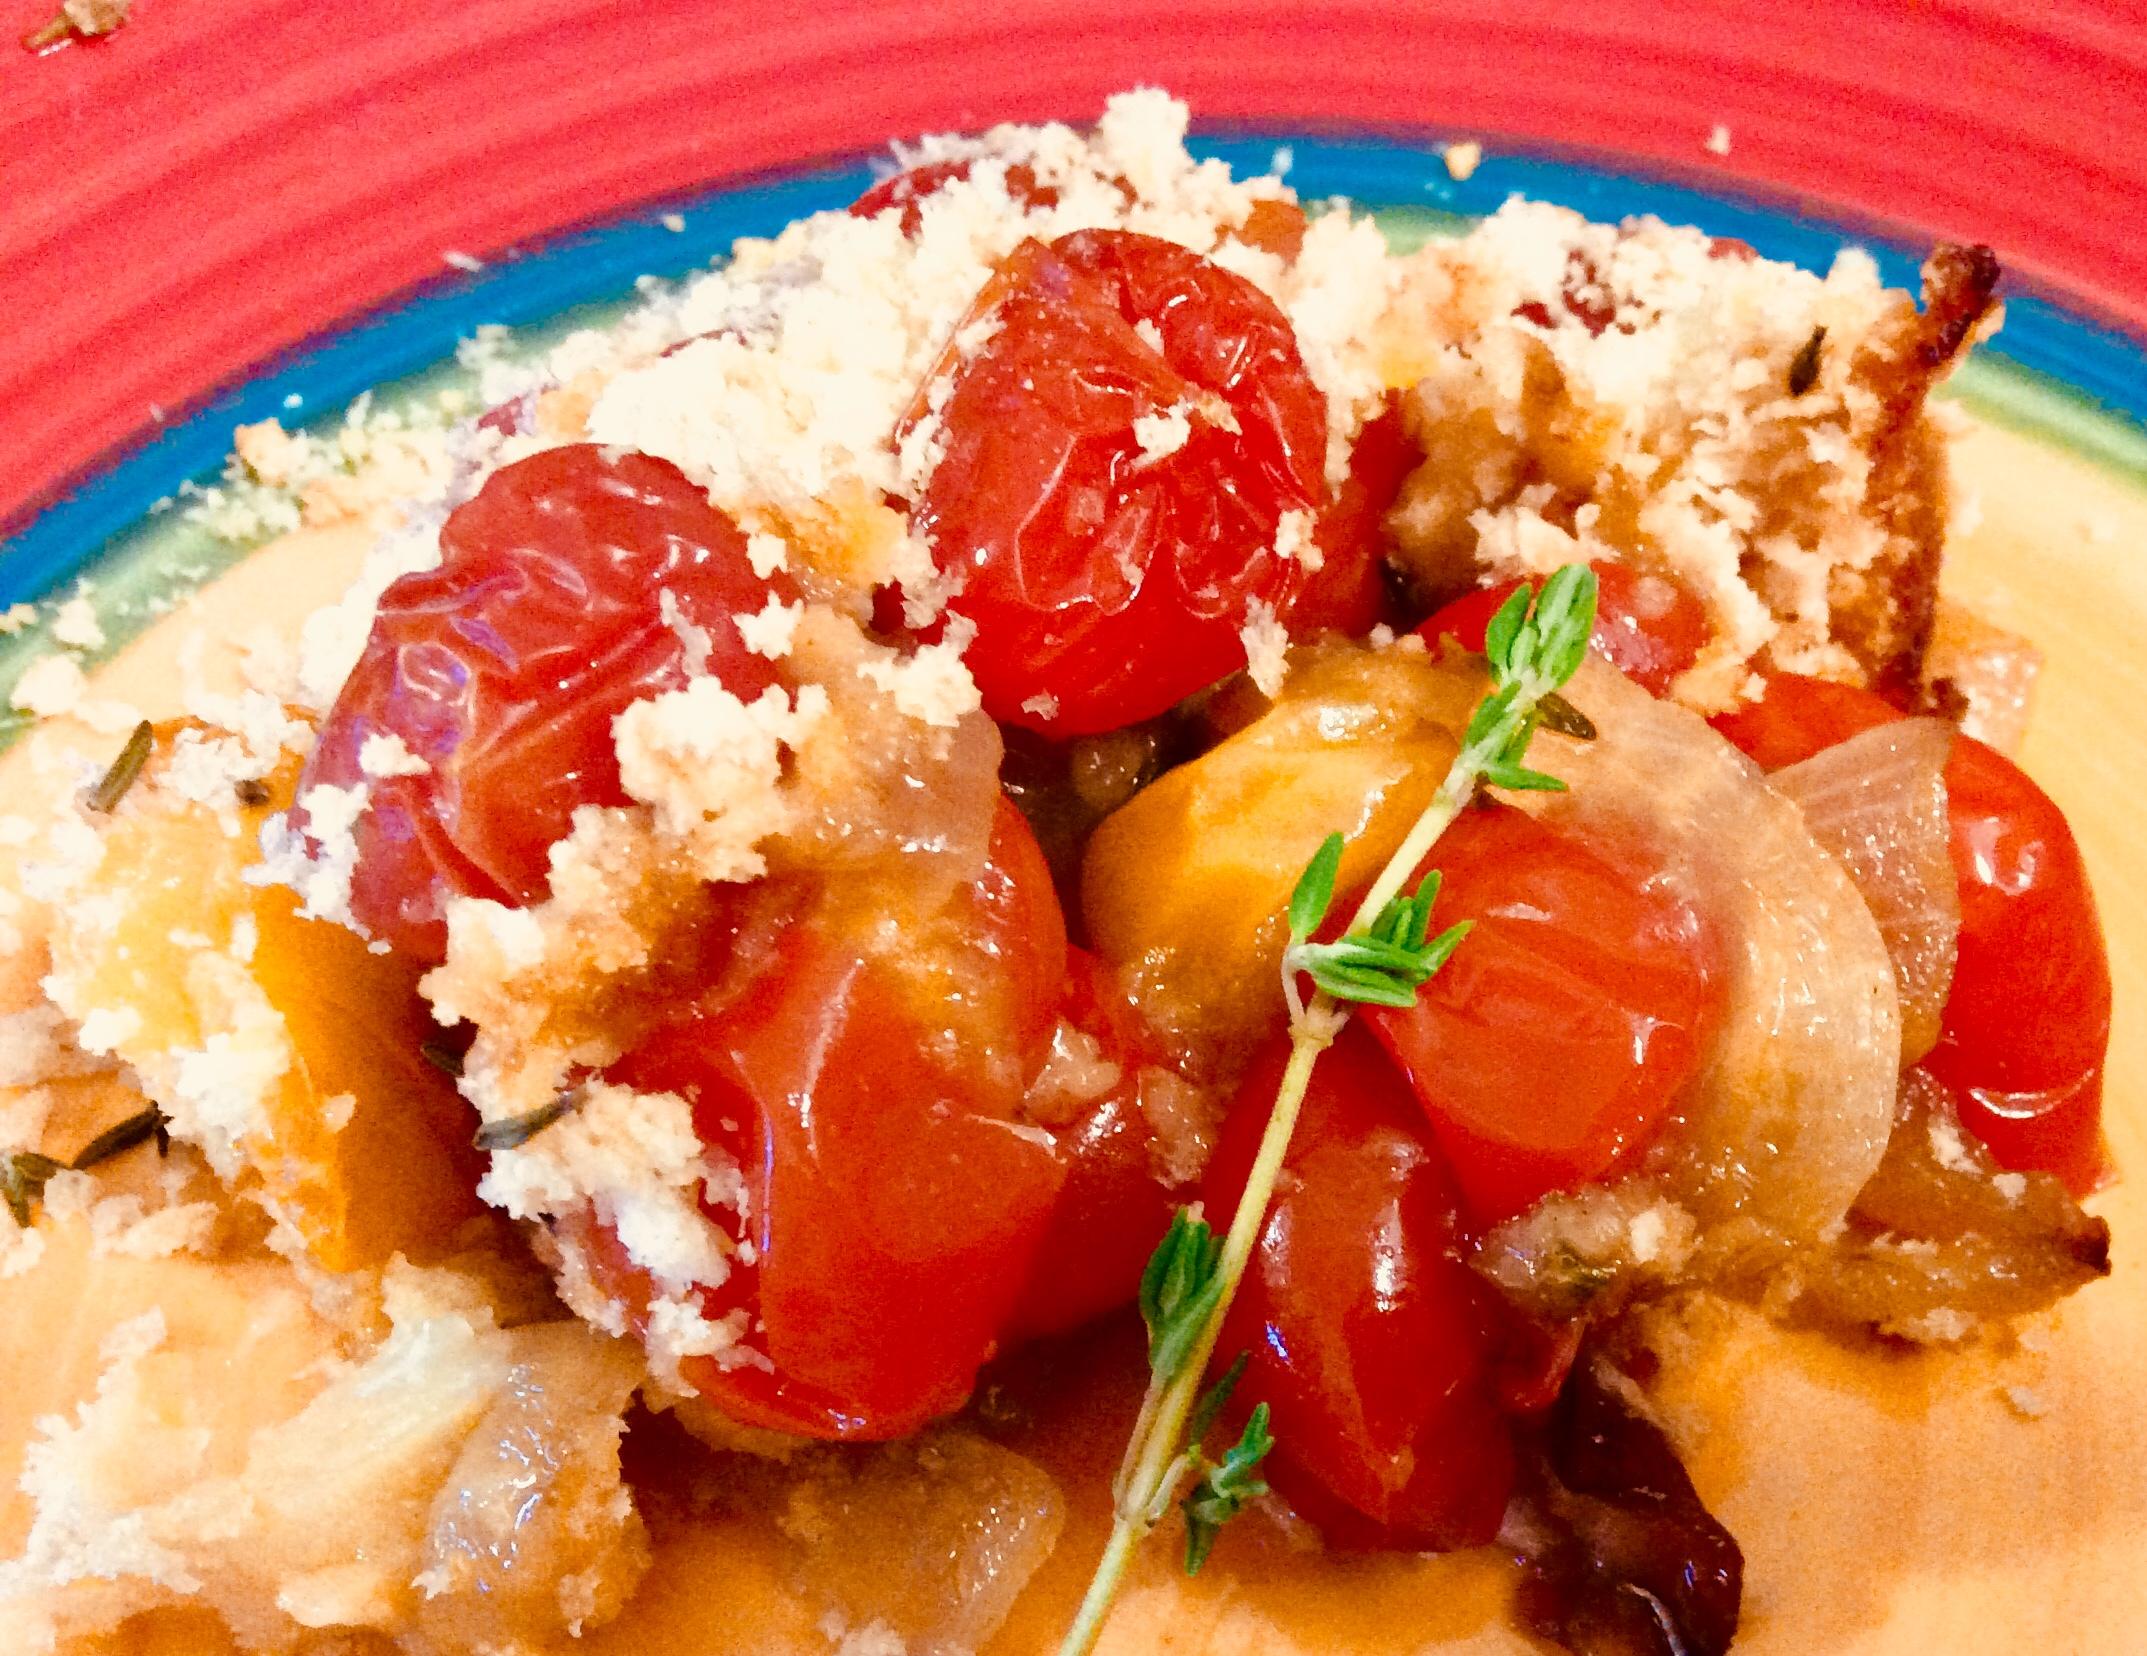 Heirloom Cherry Tomato and Thyme Crisp from Alexandersmom.com